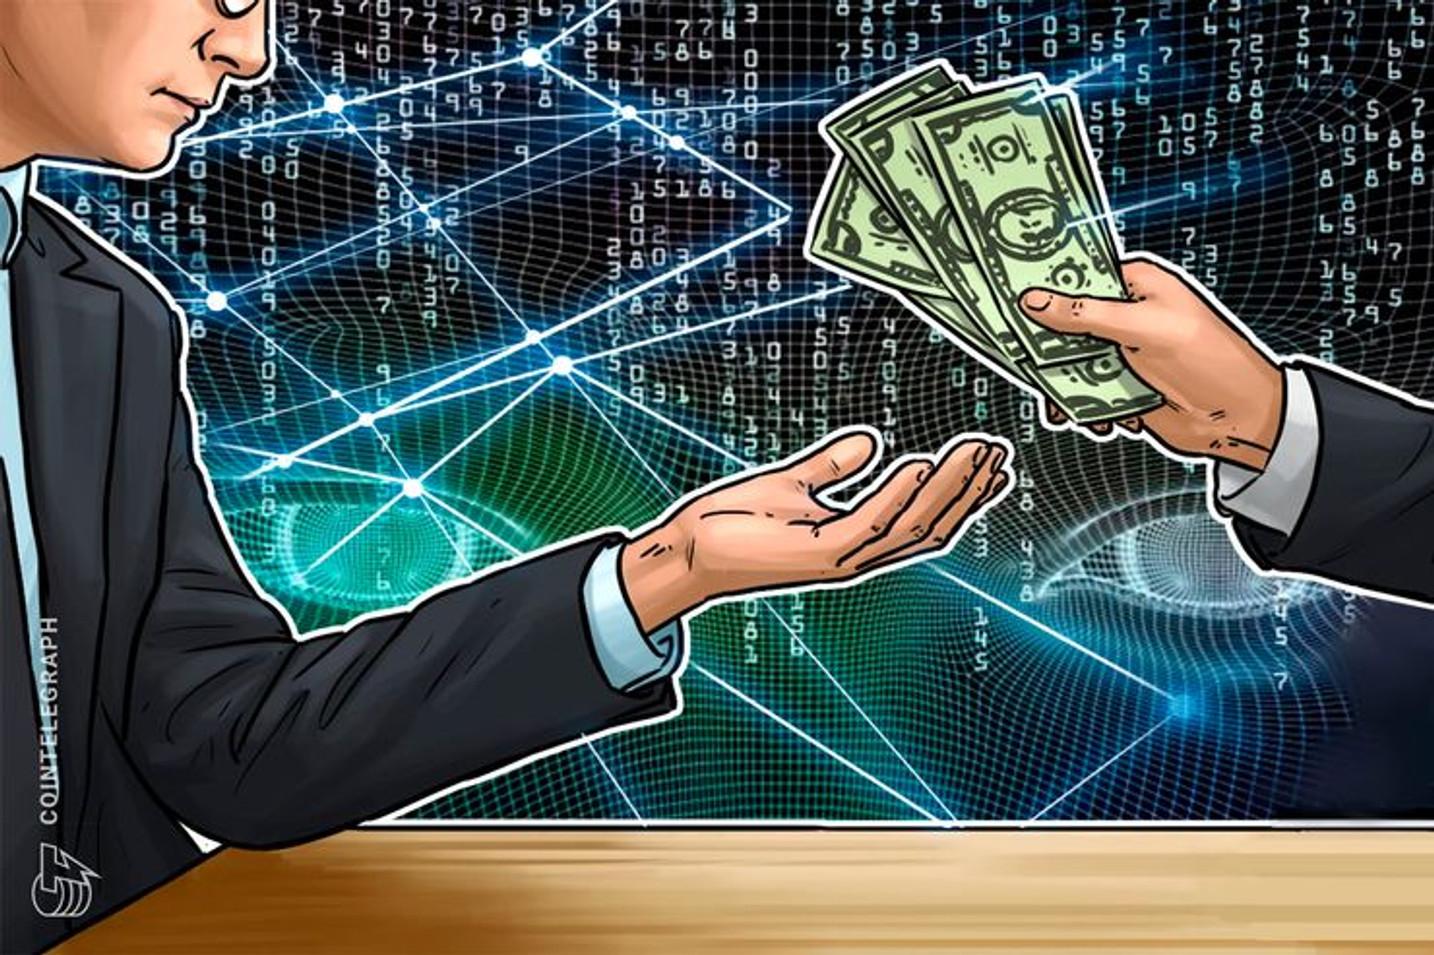 Colombia: Fintech Minka, que trabaja con conceptos Blockchain, recibió inversión de tres millones de dólares